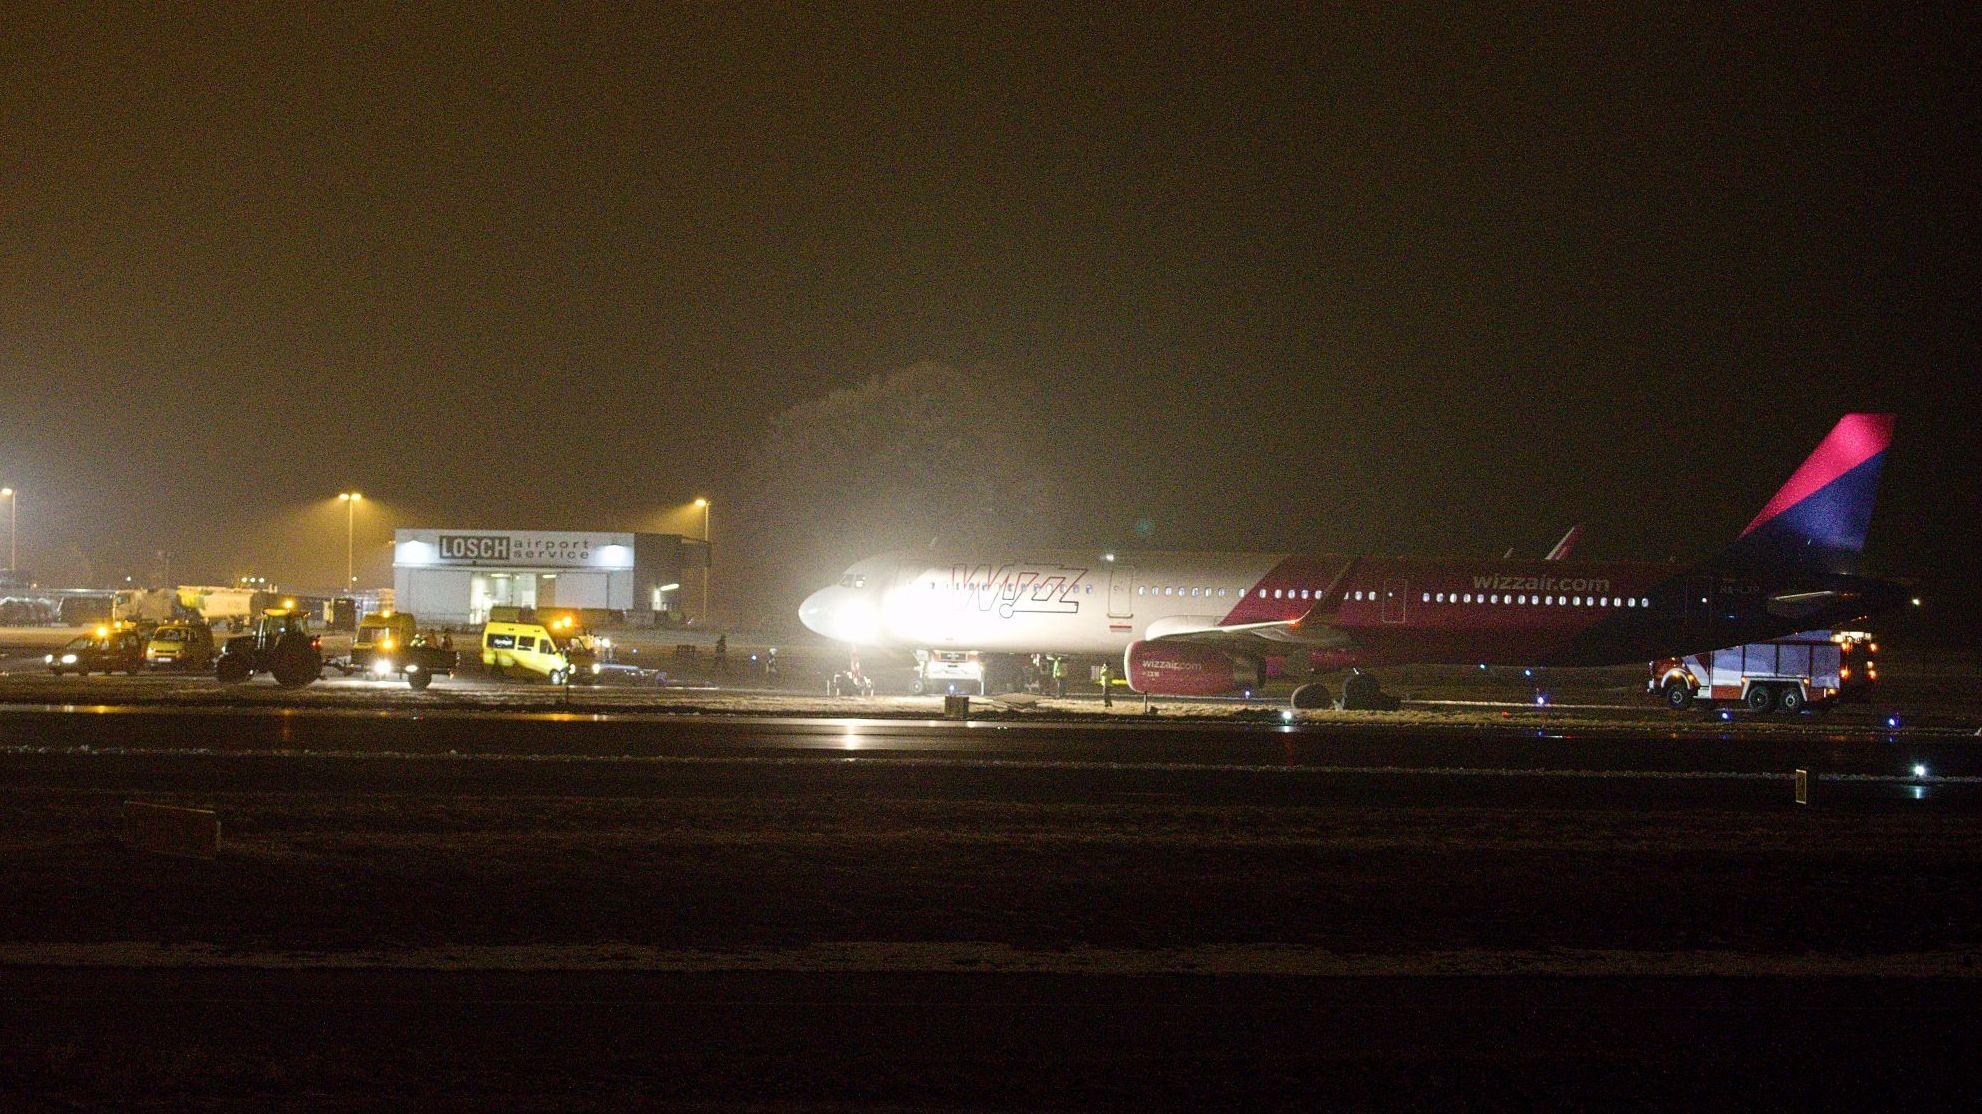 Flugzeug auf dem Allgäu Airport